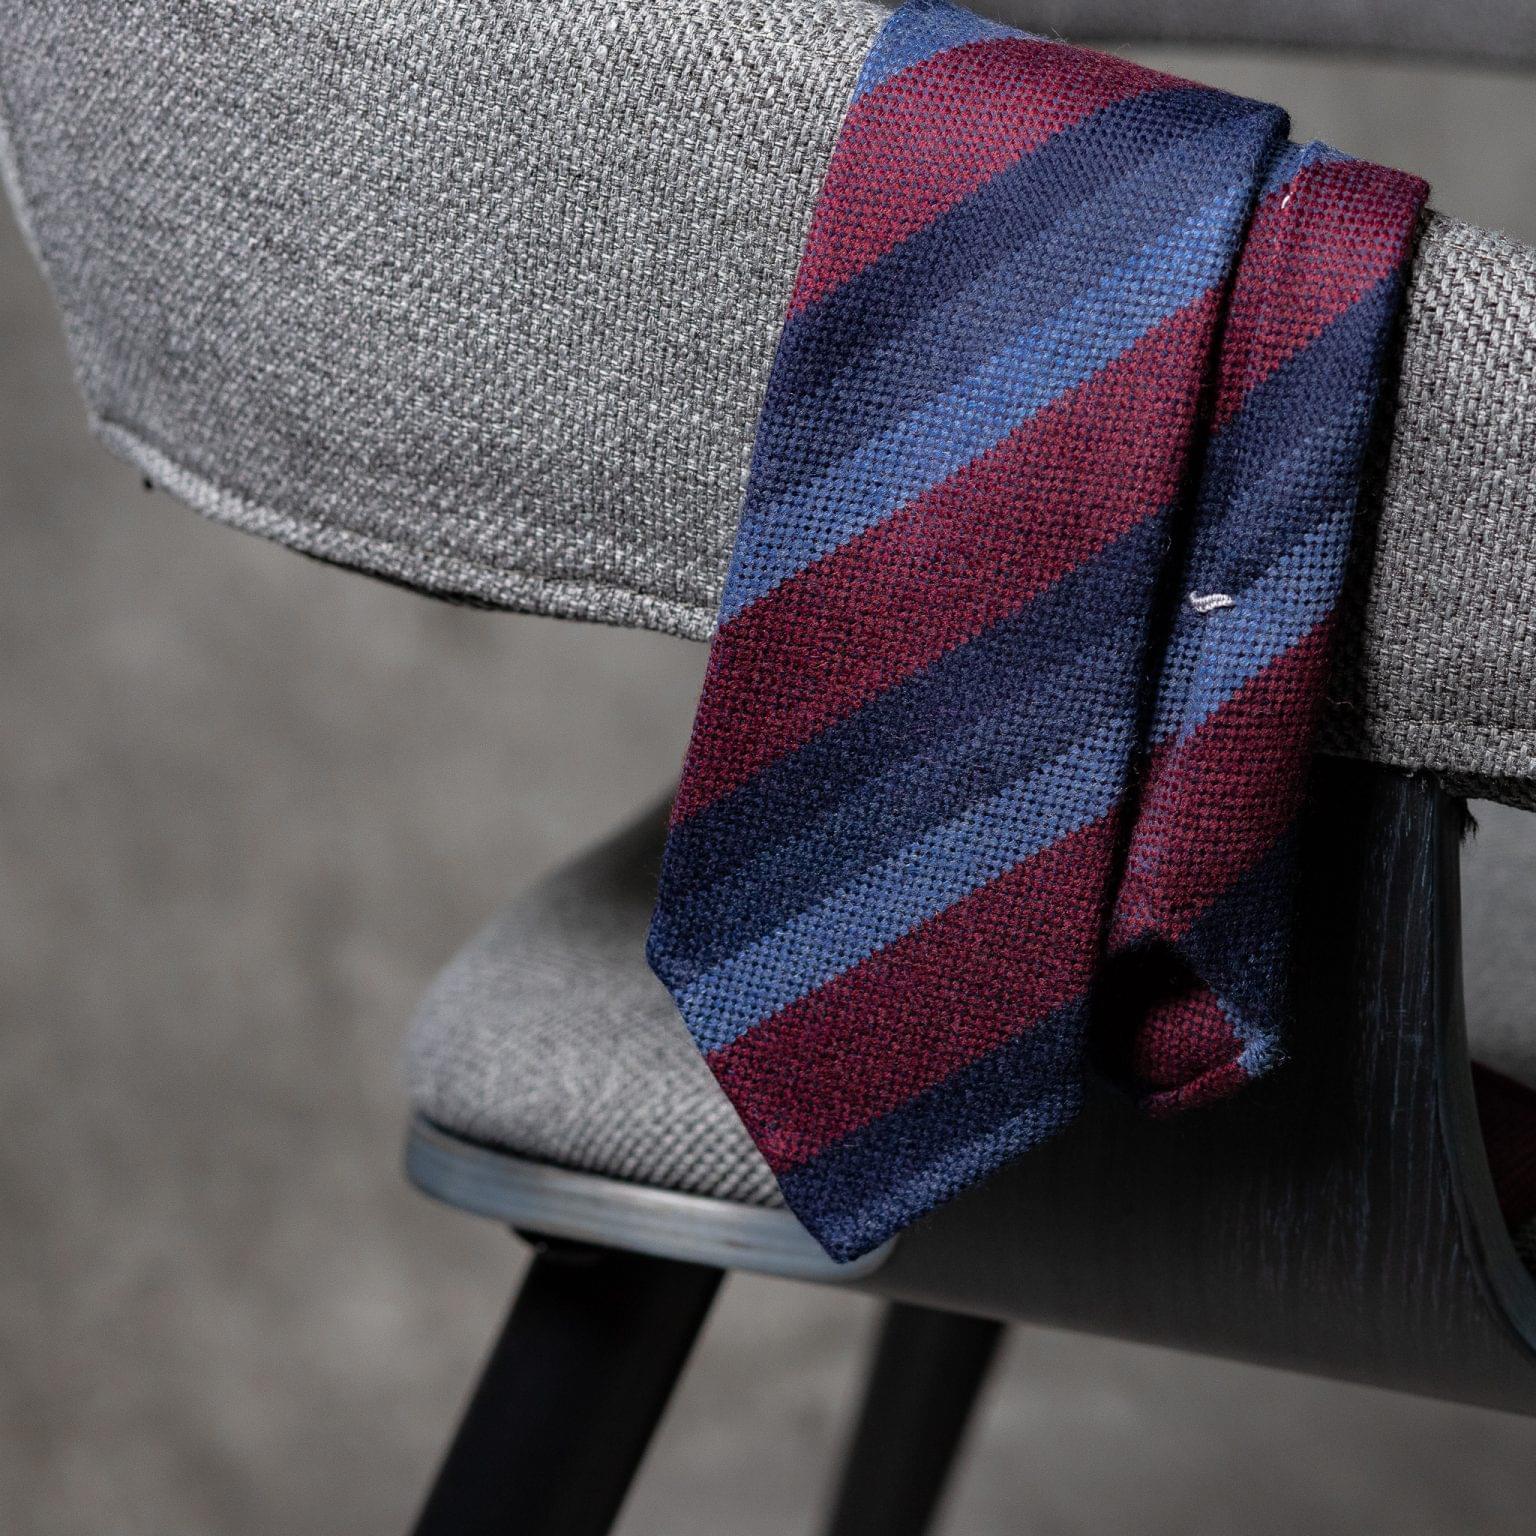 WOOL-LANA-0512-Tie-Initials-Corbata-Iniciales-The-Seelk-2